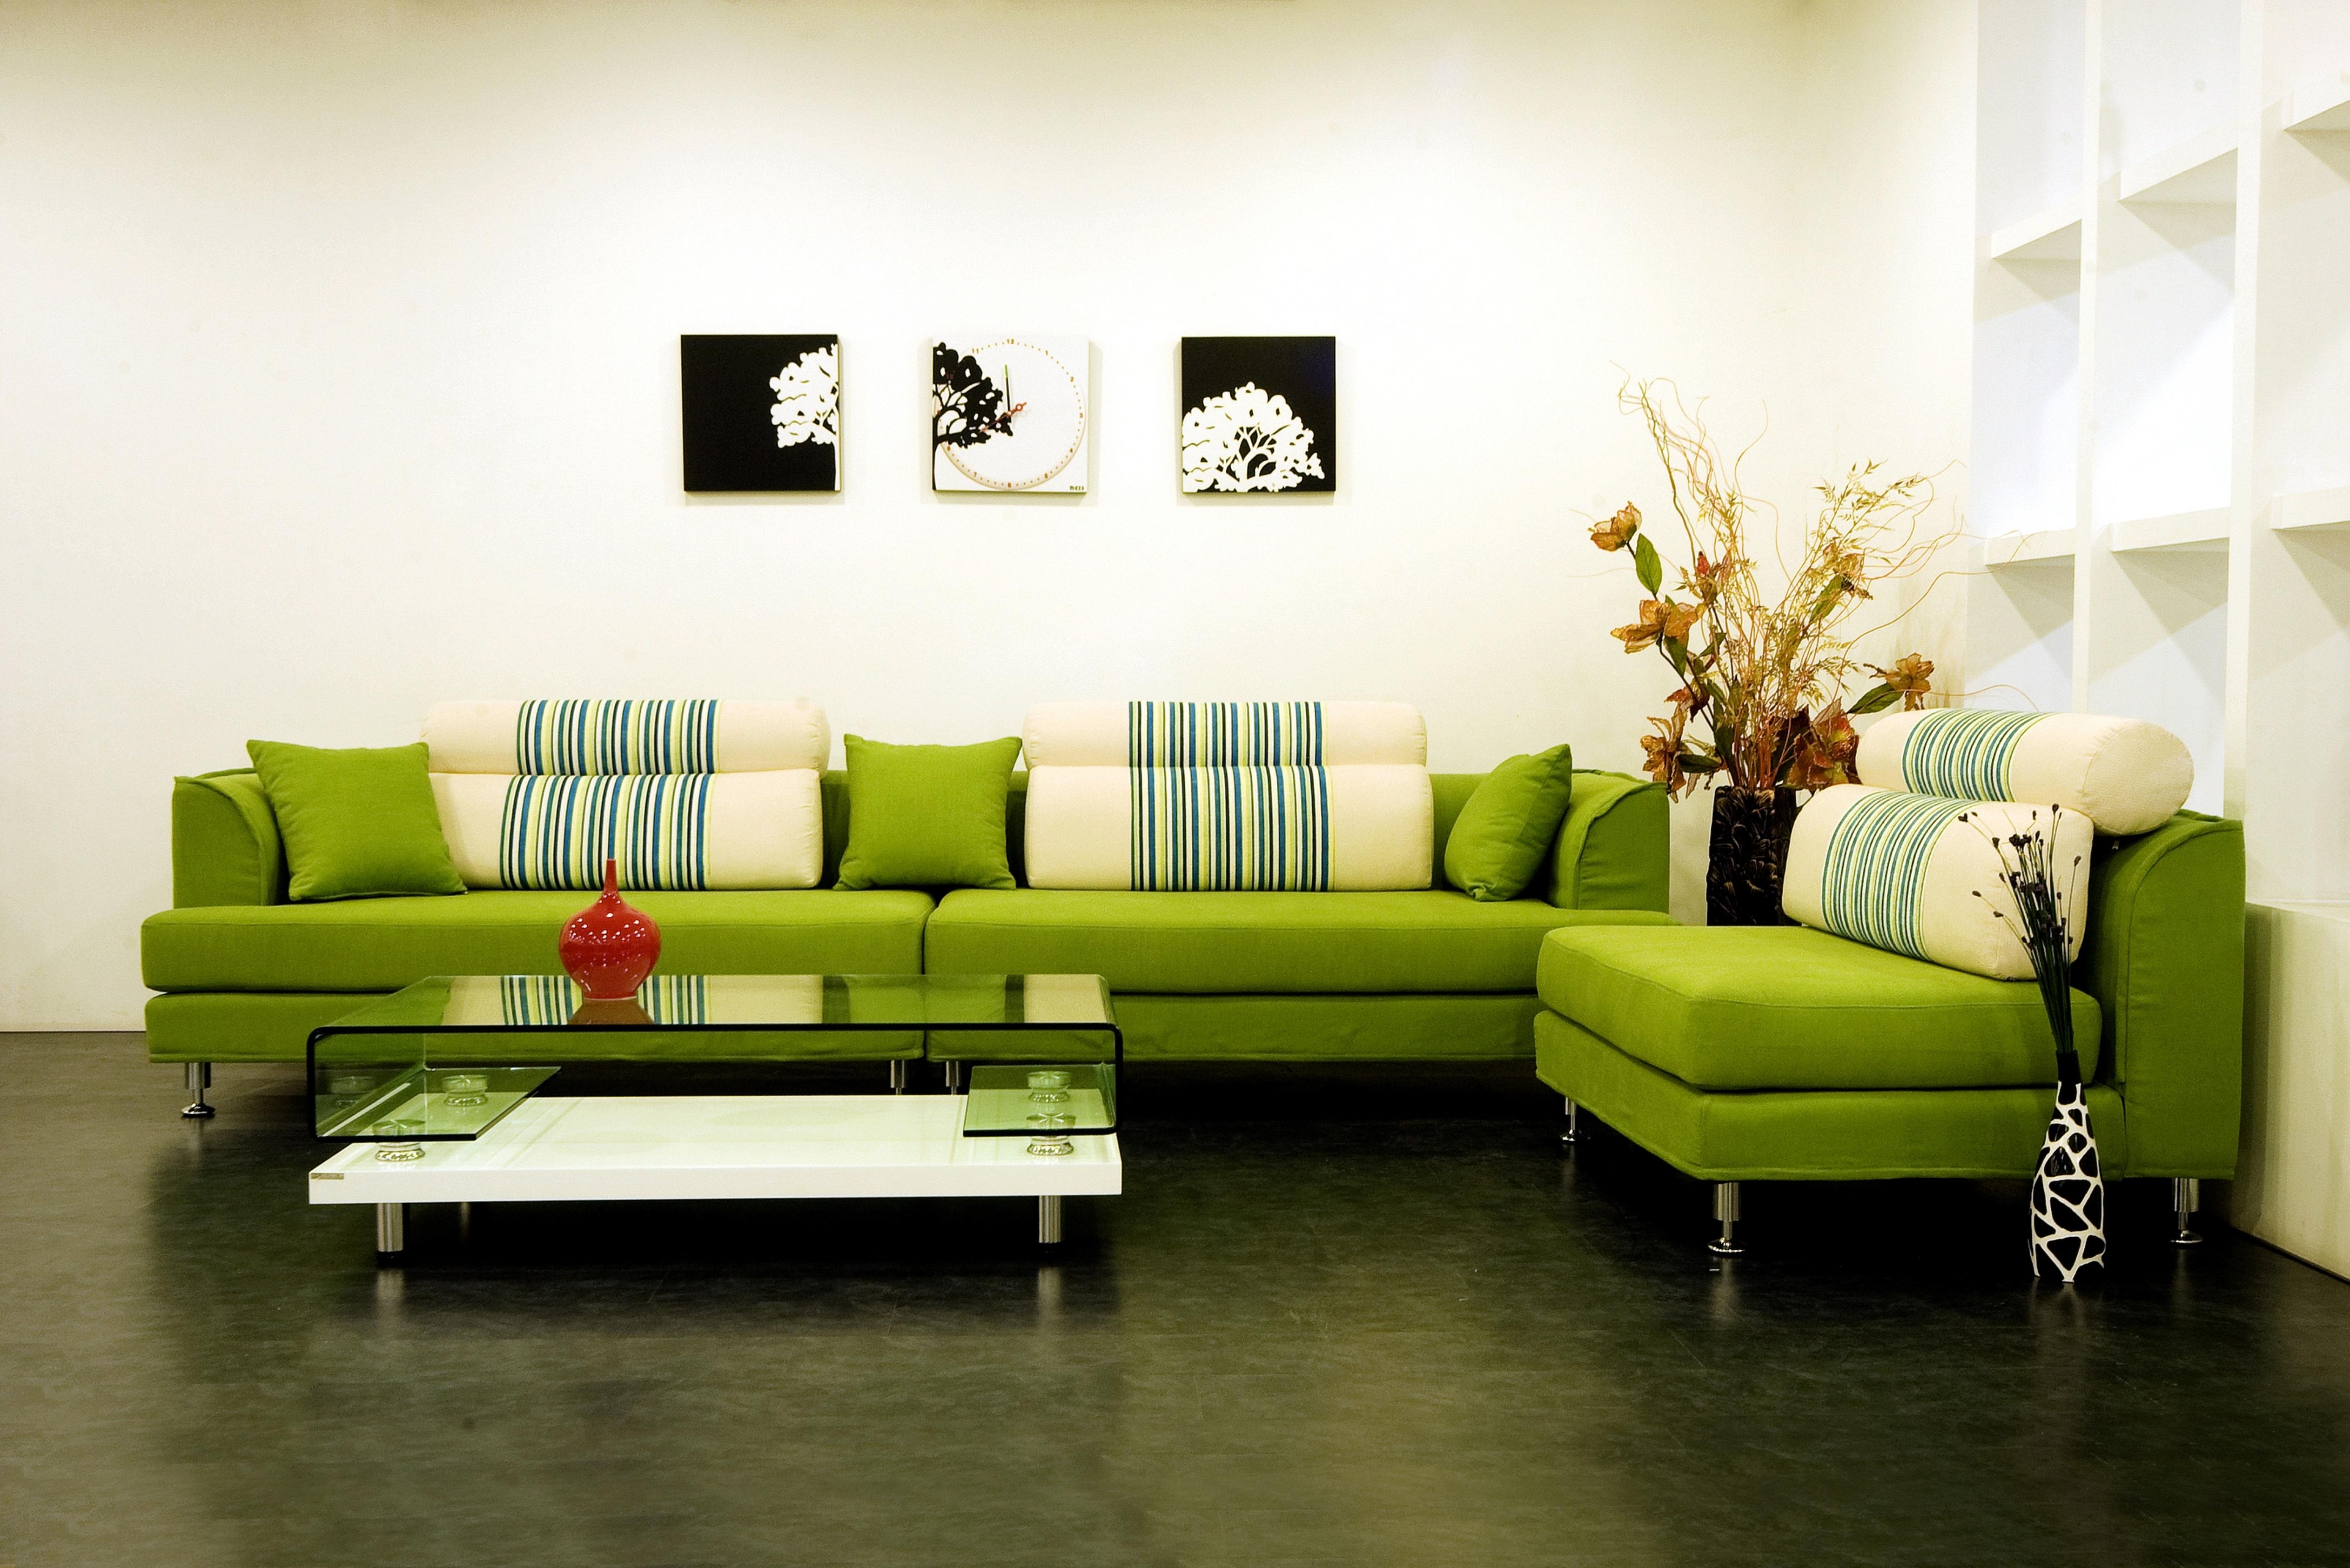 Hintergrundbilder : Malerei, Zimmer, Innere, Tabelle, Vasen, Couch ...